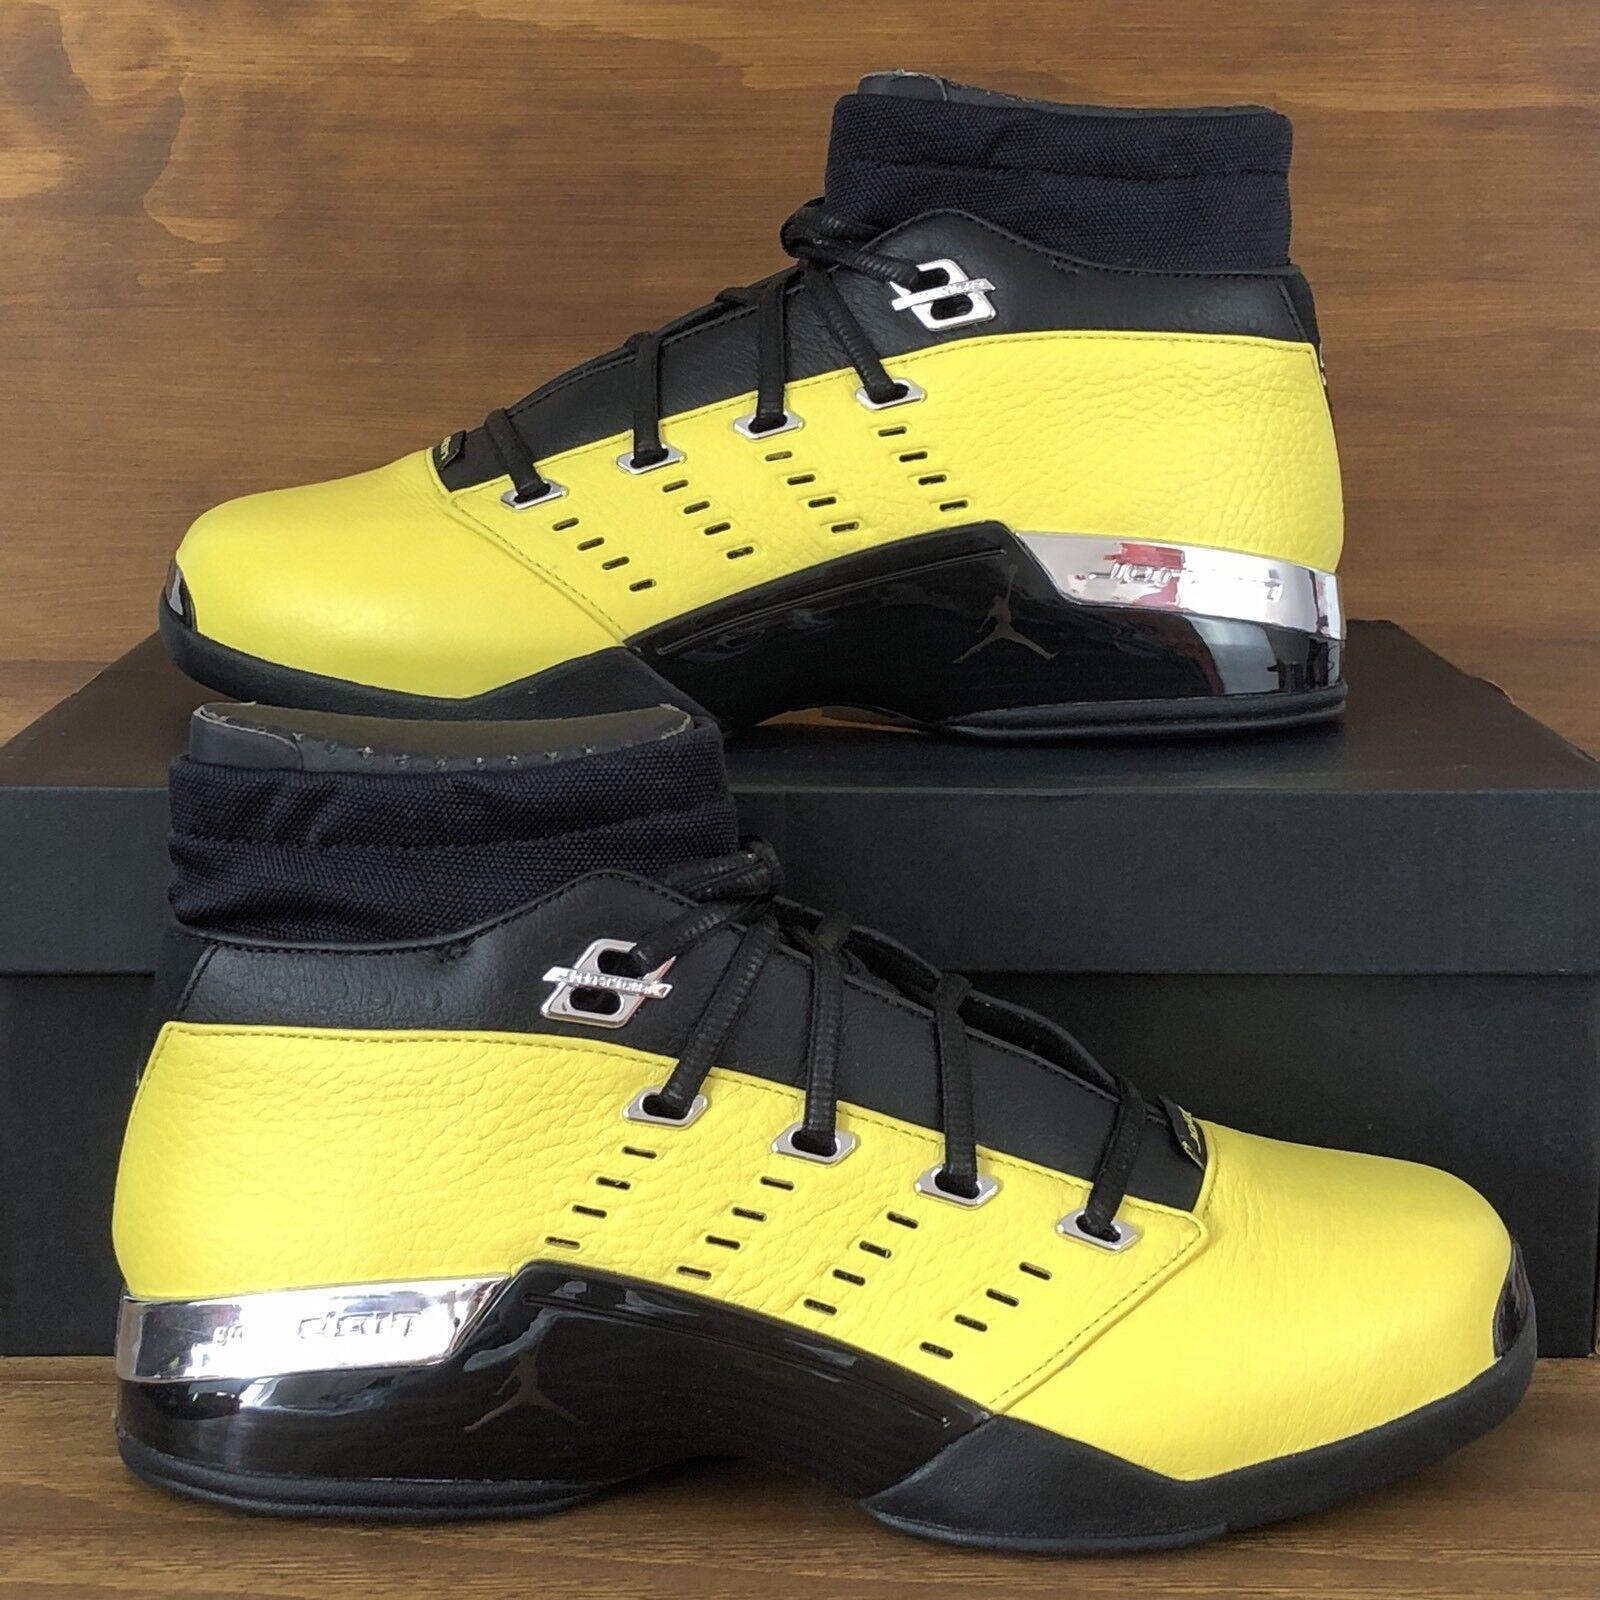 Air Jordan 17 Retro Low Solefly Reverse Lightning Yellow Black [AJ7321-003] Size